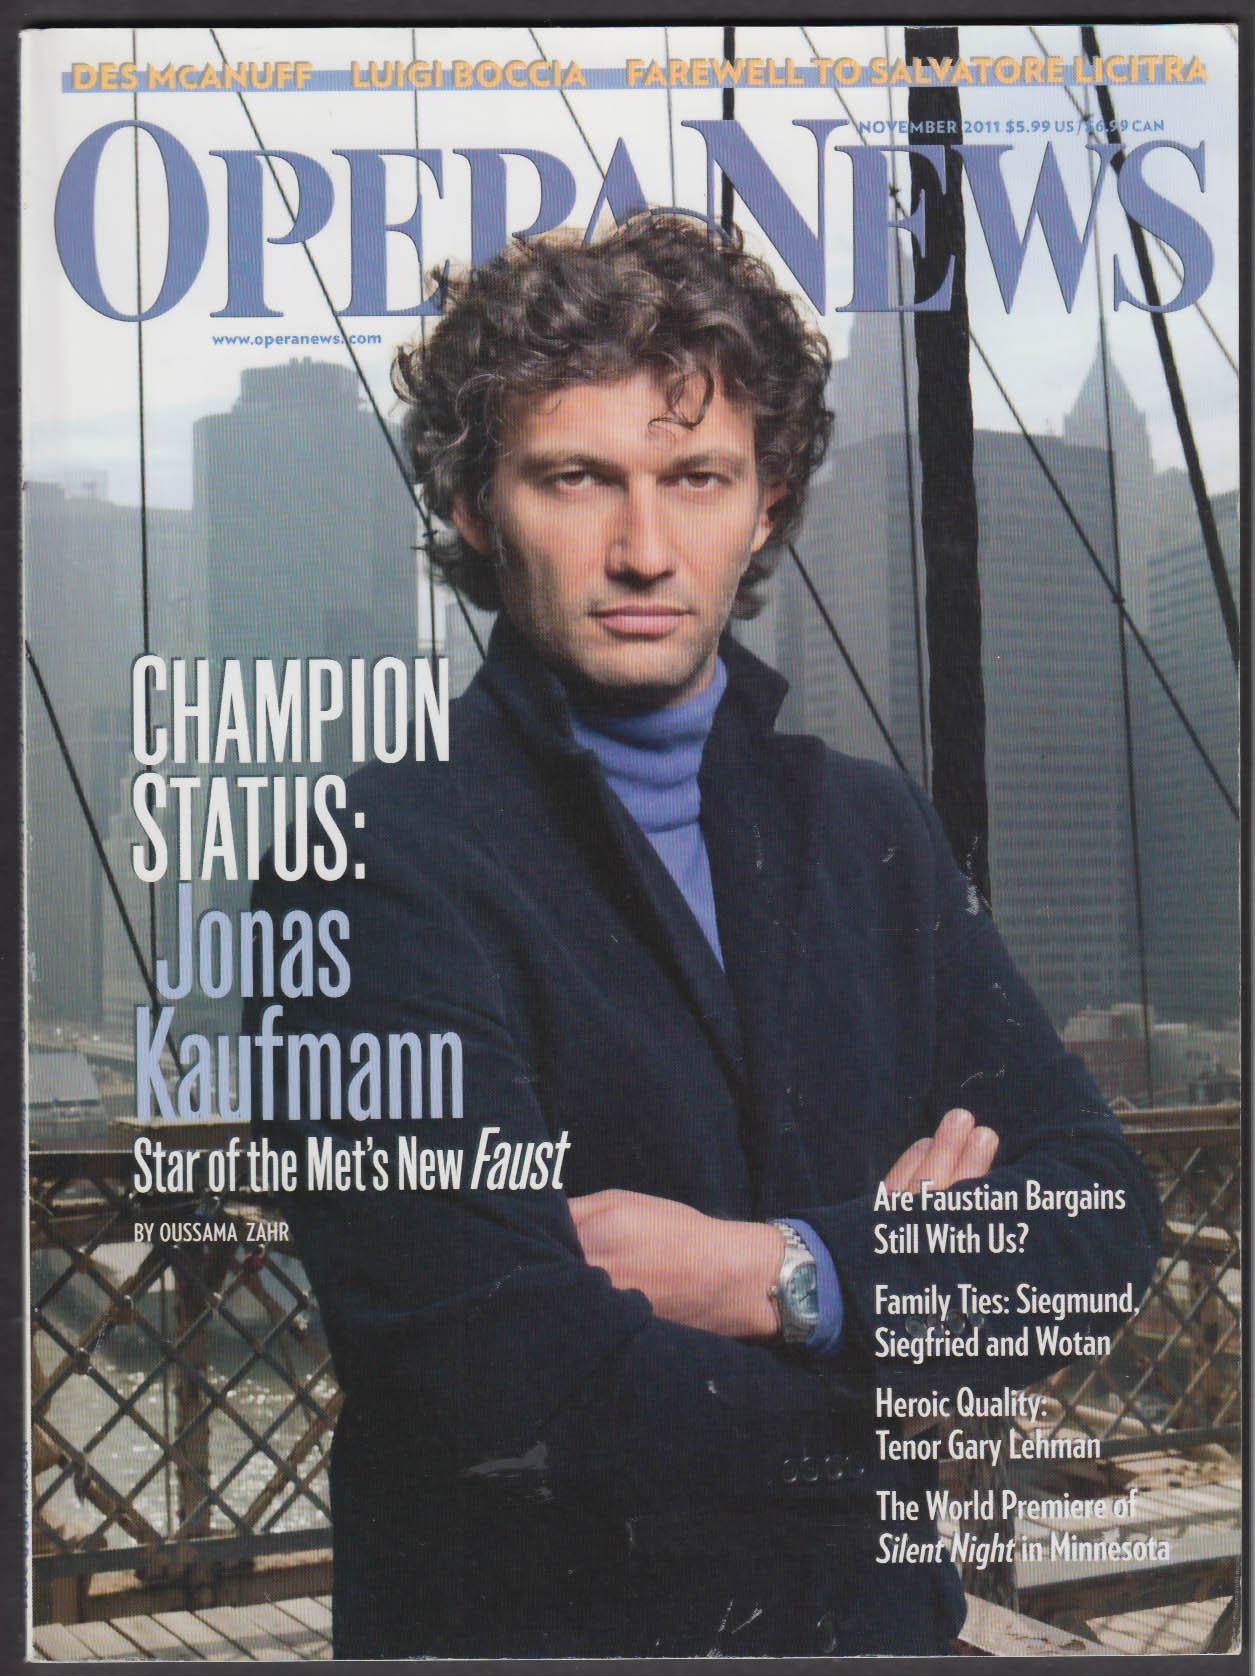 OPERA NEWS Jonas Kaufmann Tenor Luigi Boccia Kevin Puts Gary Lehman ++ 11 2011